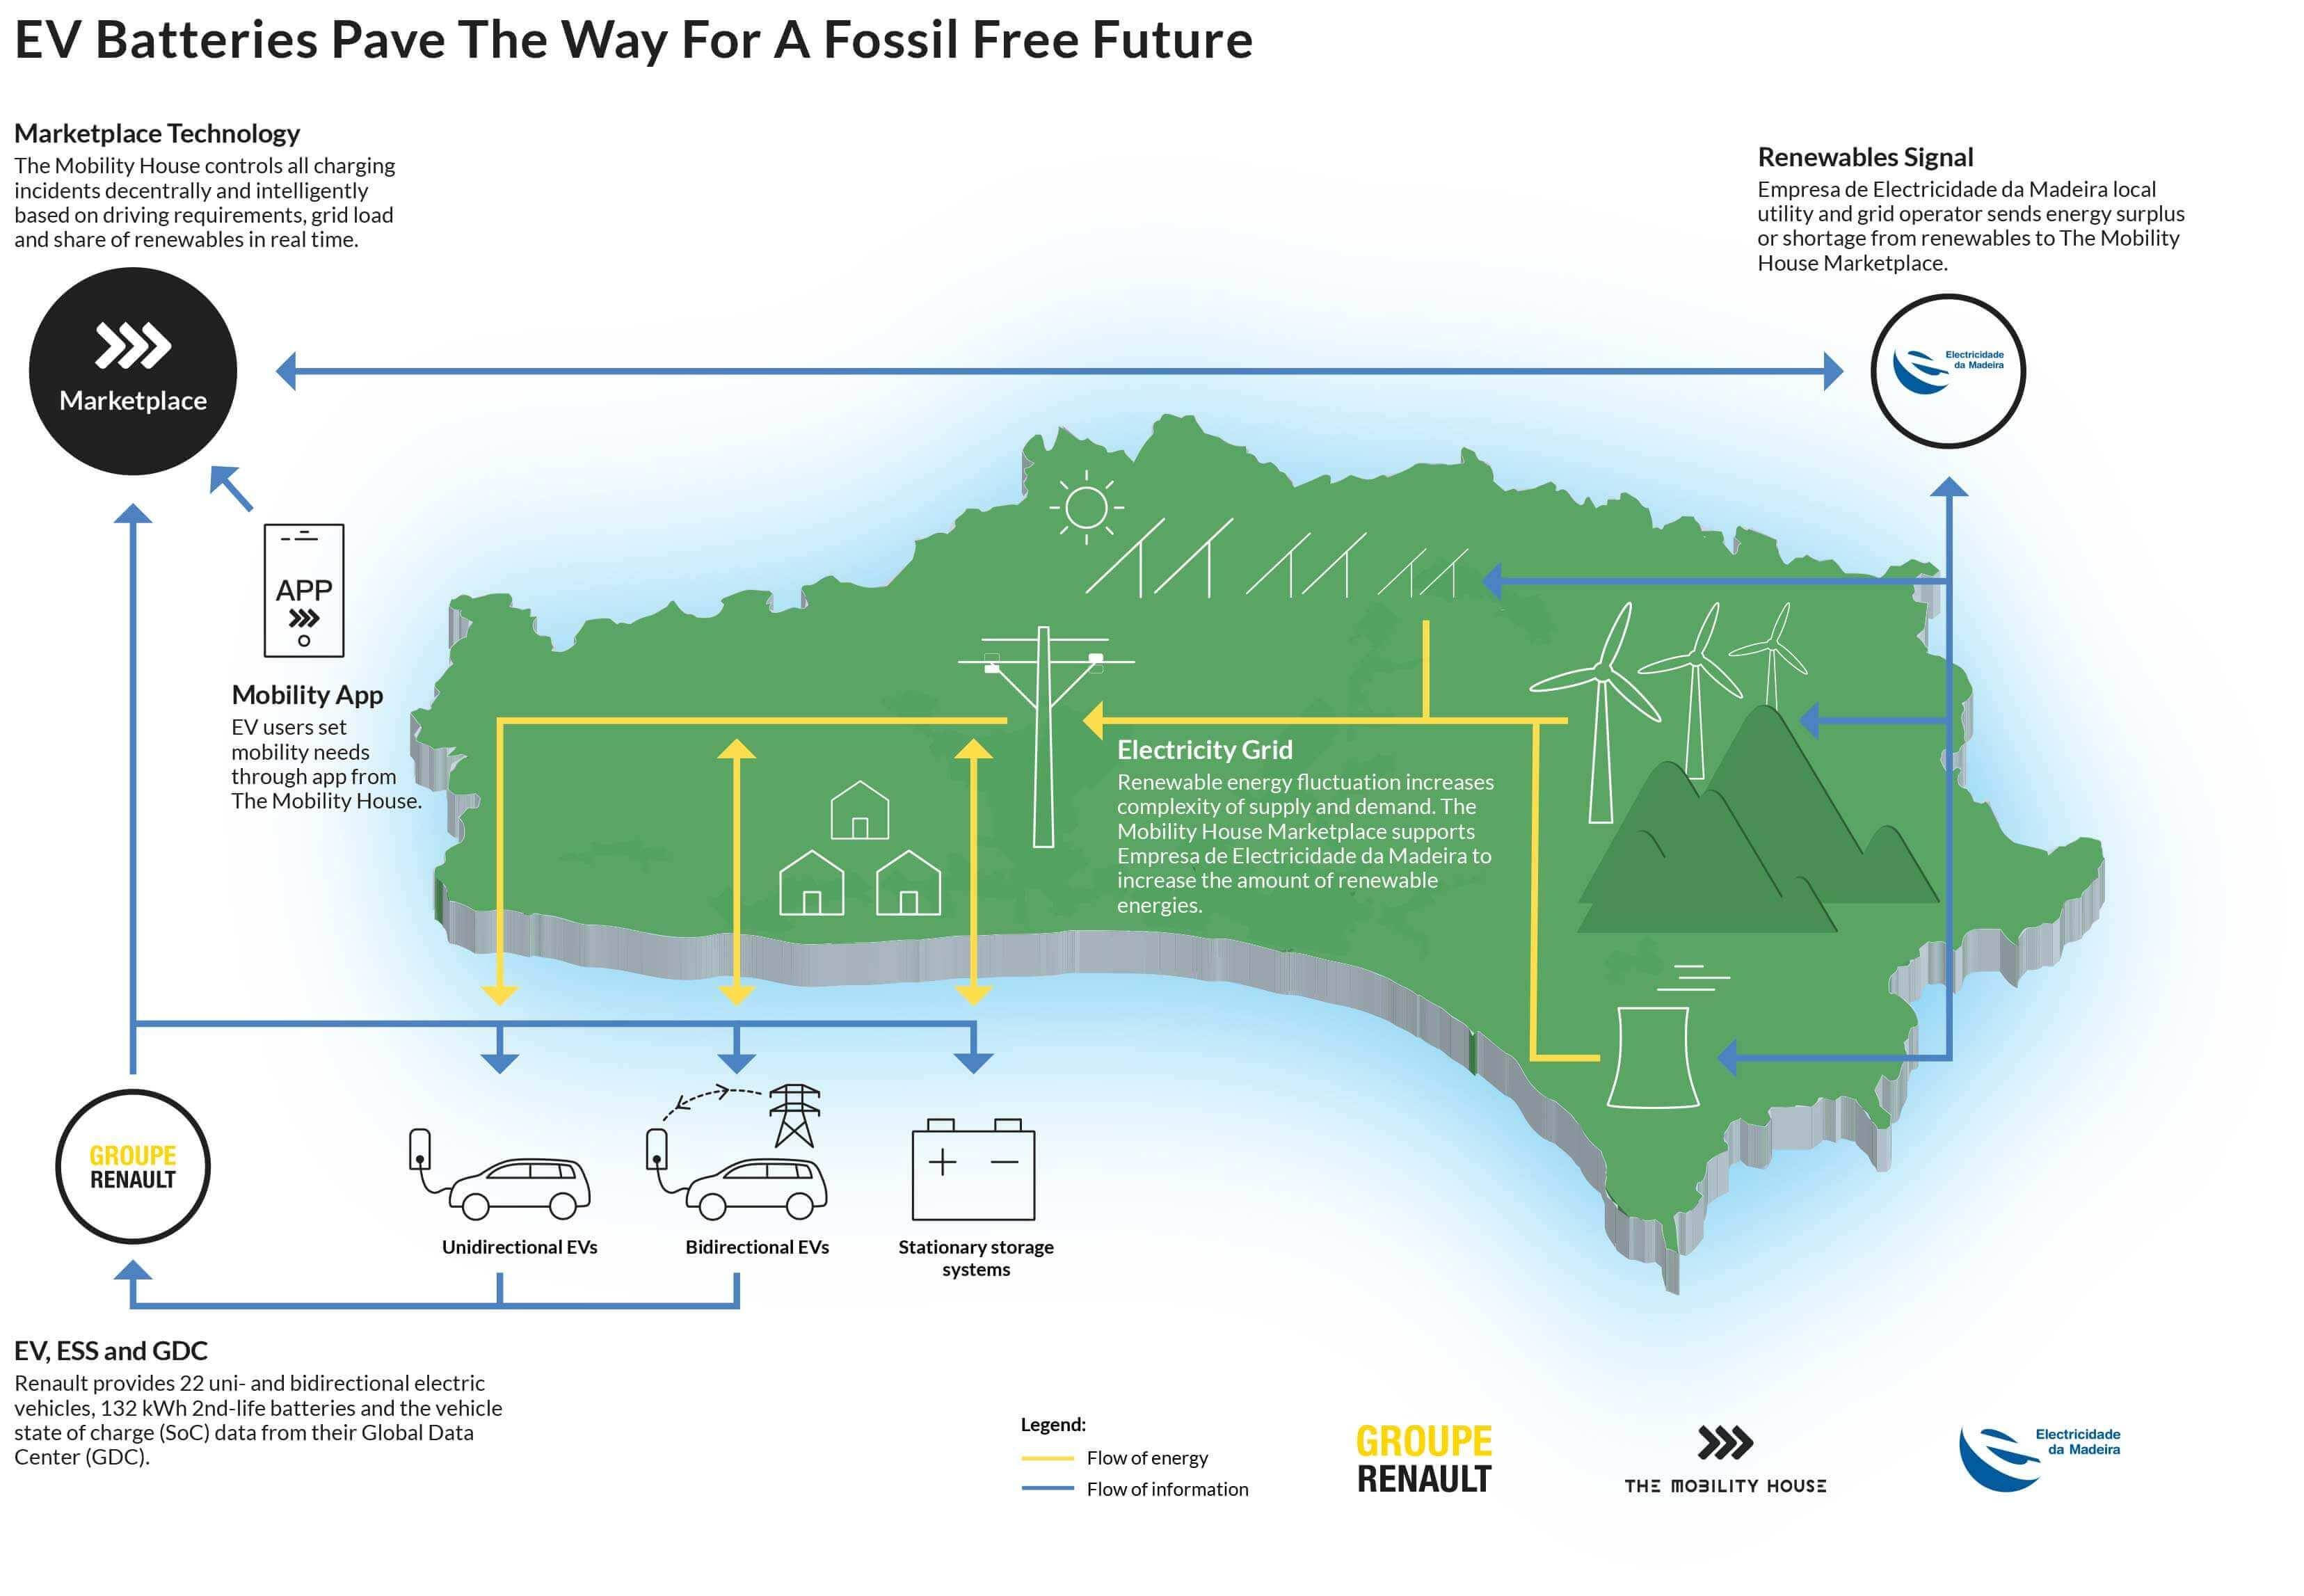 porto-santo-fossil-free